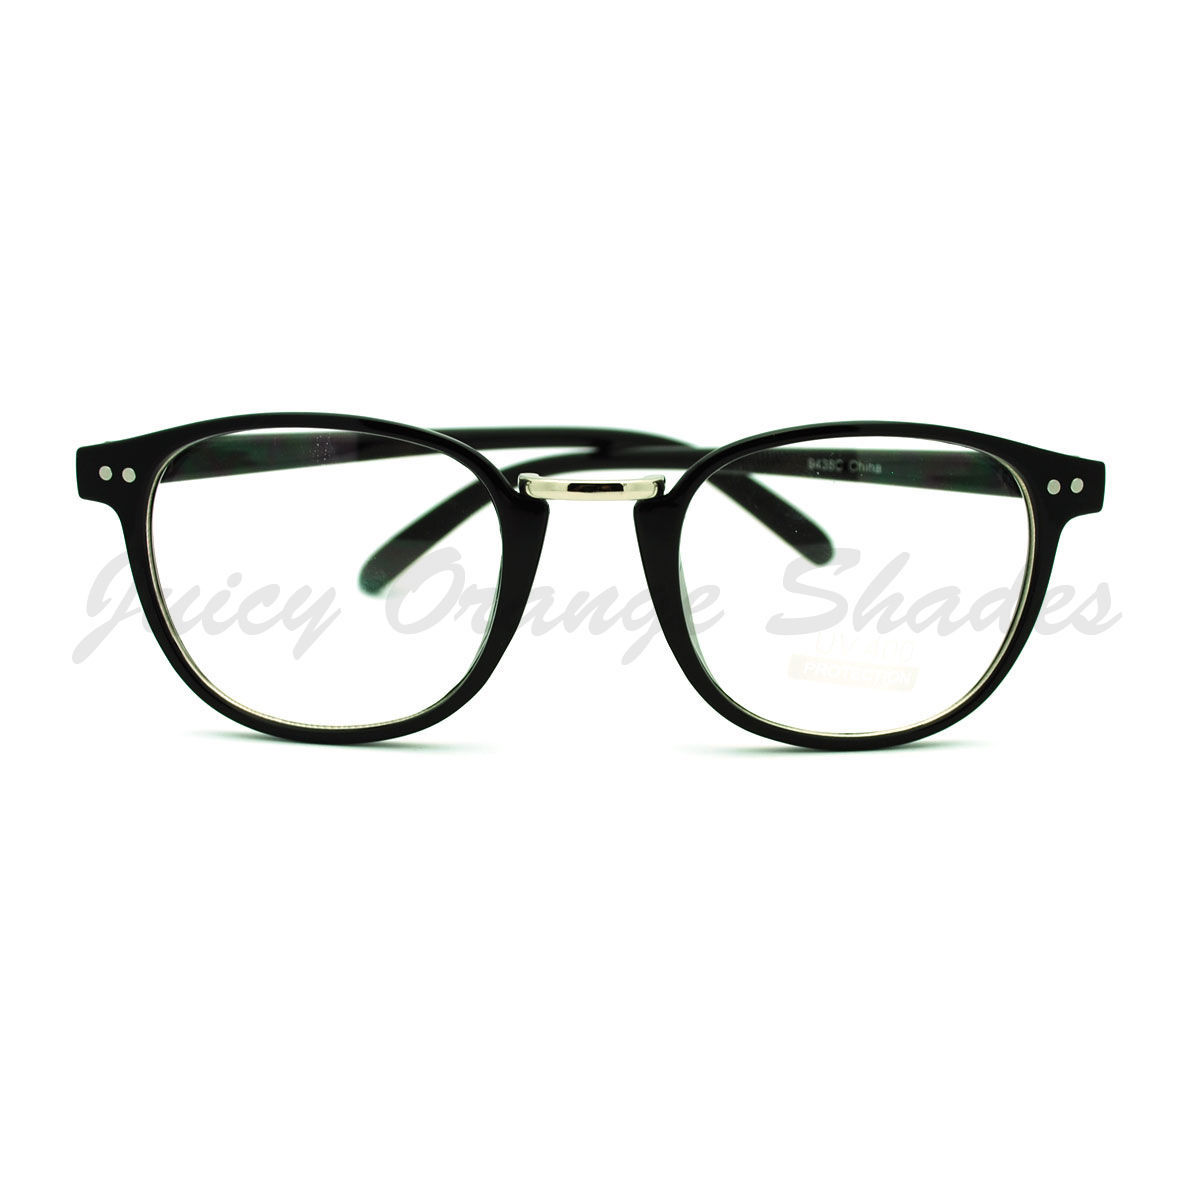 Clear Lens Smart Fashion Glasses Round Frame Metal Bridge